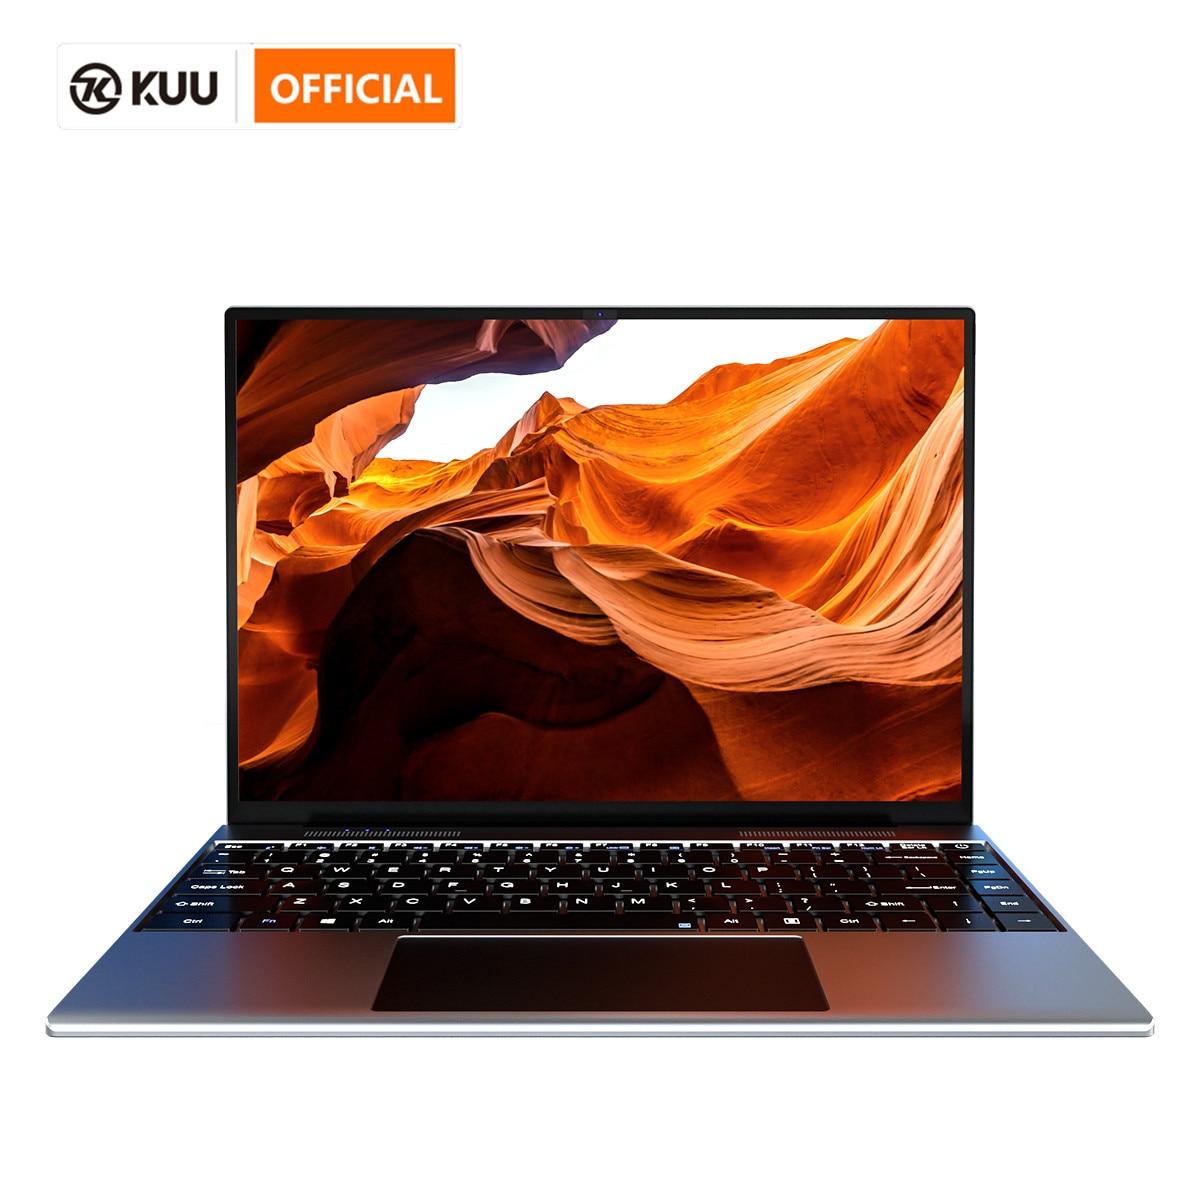 Metal completo 13.5 Polegada 3k ips tela intel pentium quad core portátil bloqueio de impressão digital retroiluminado windows 10 estudante classe notebook